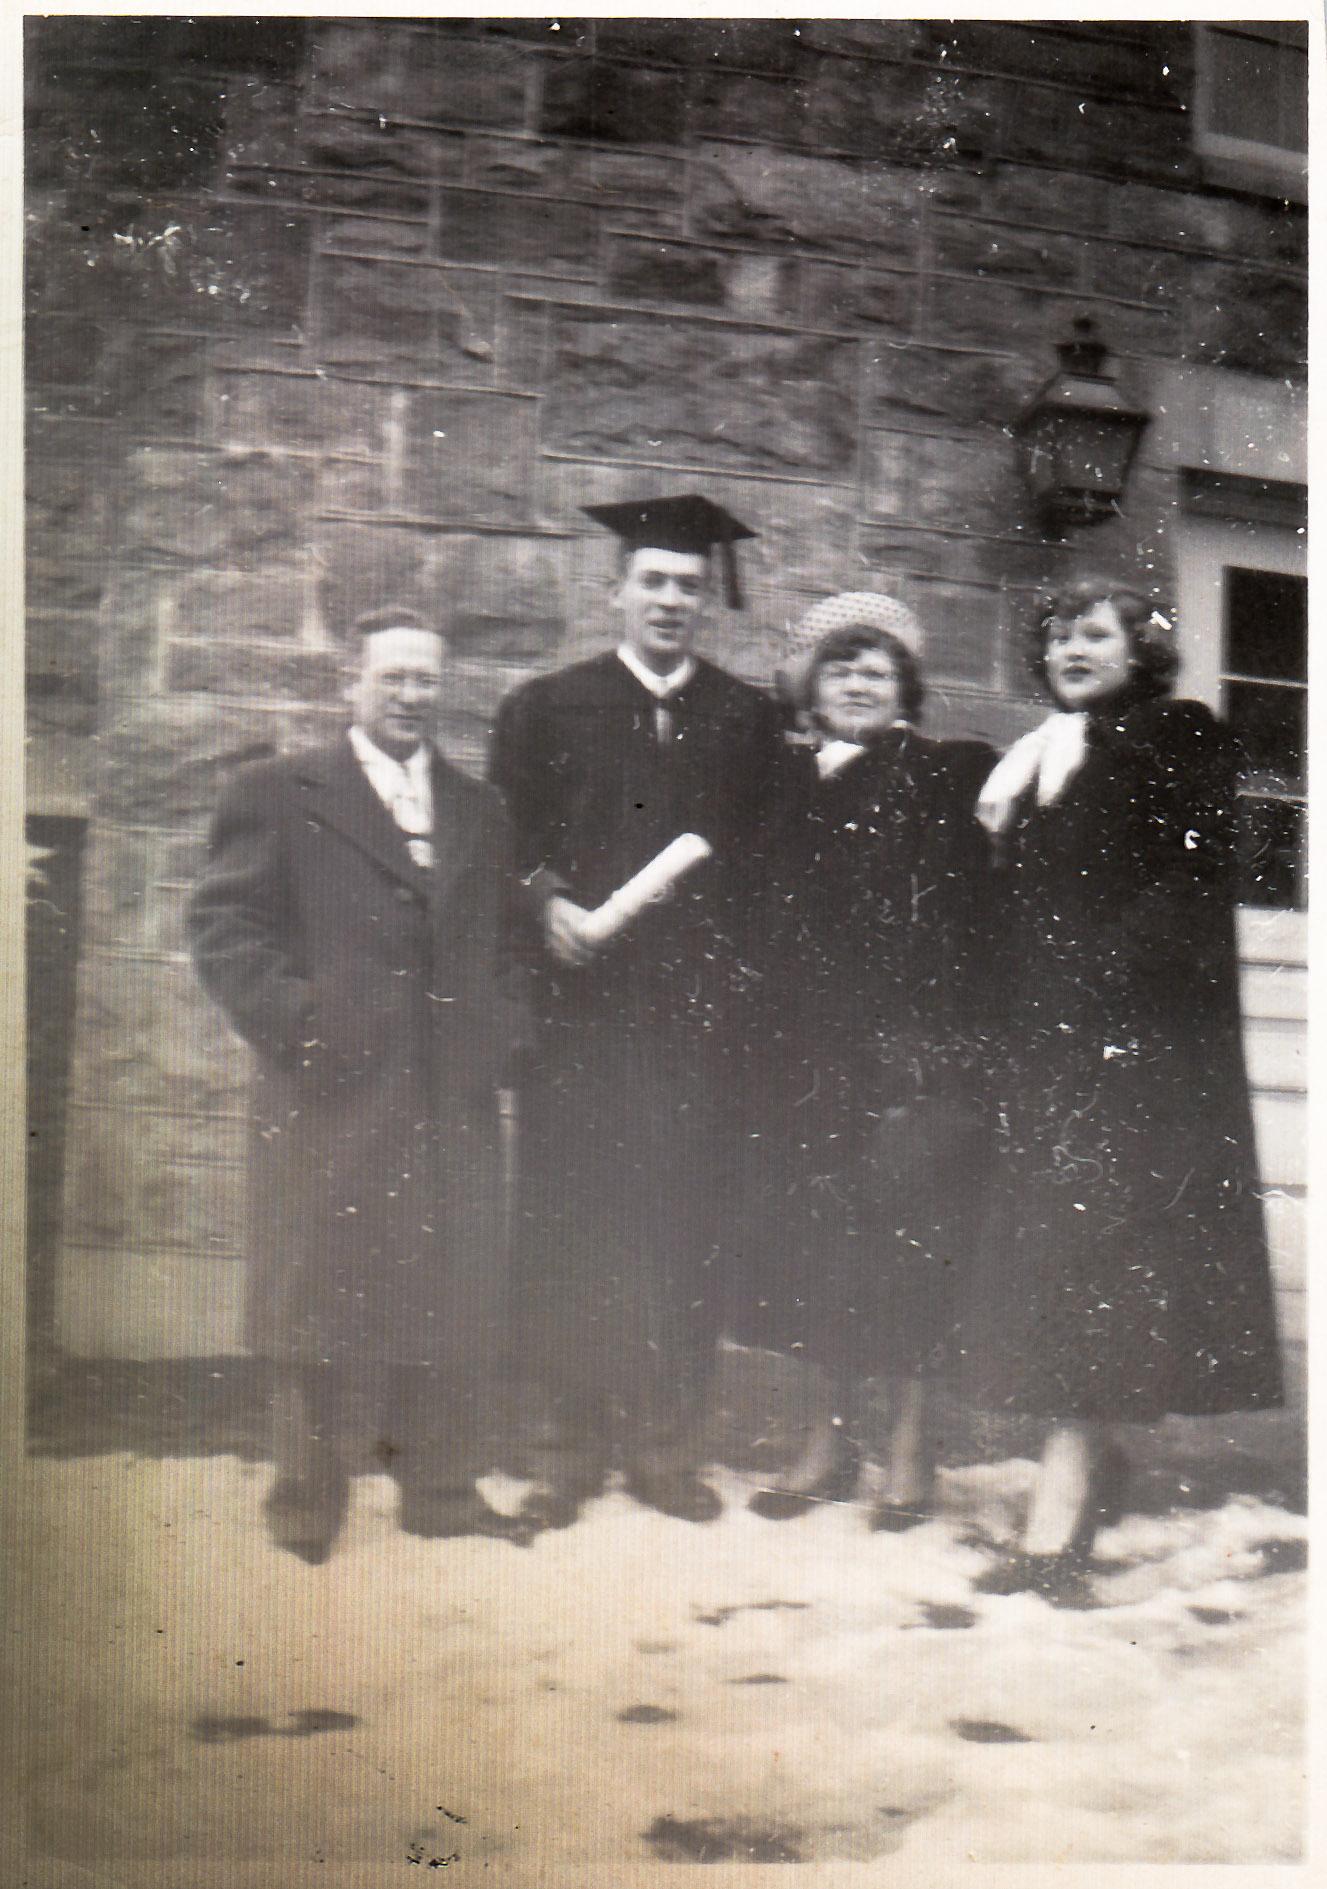 Ben, Morty, Fay, Arlene - Morty's graduation